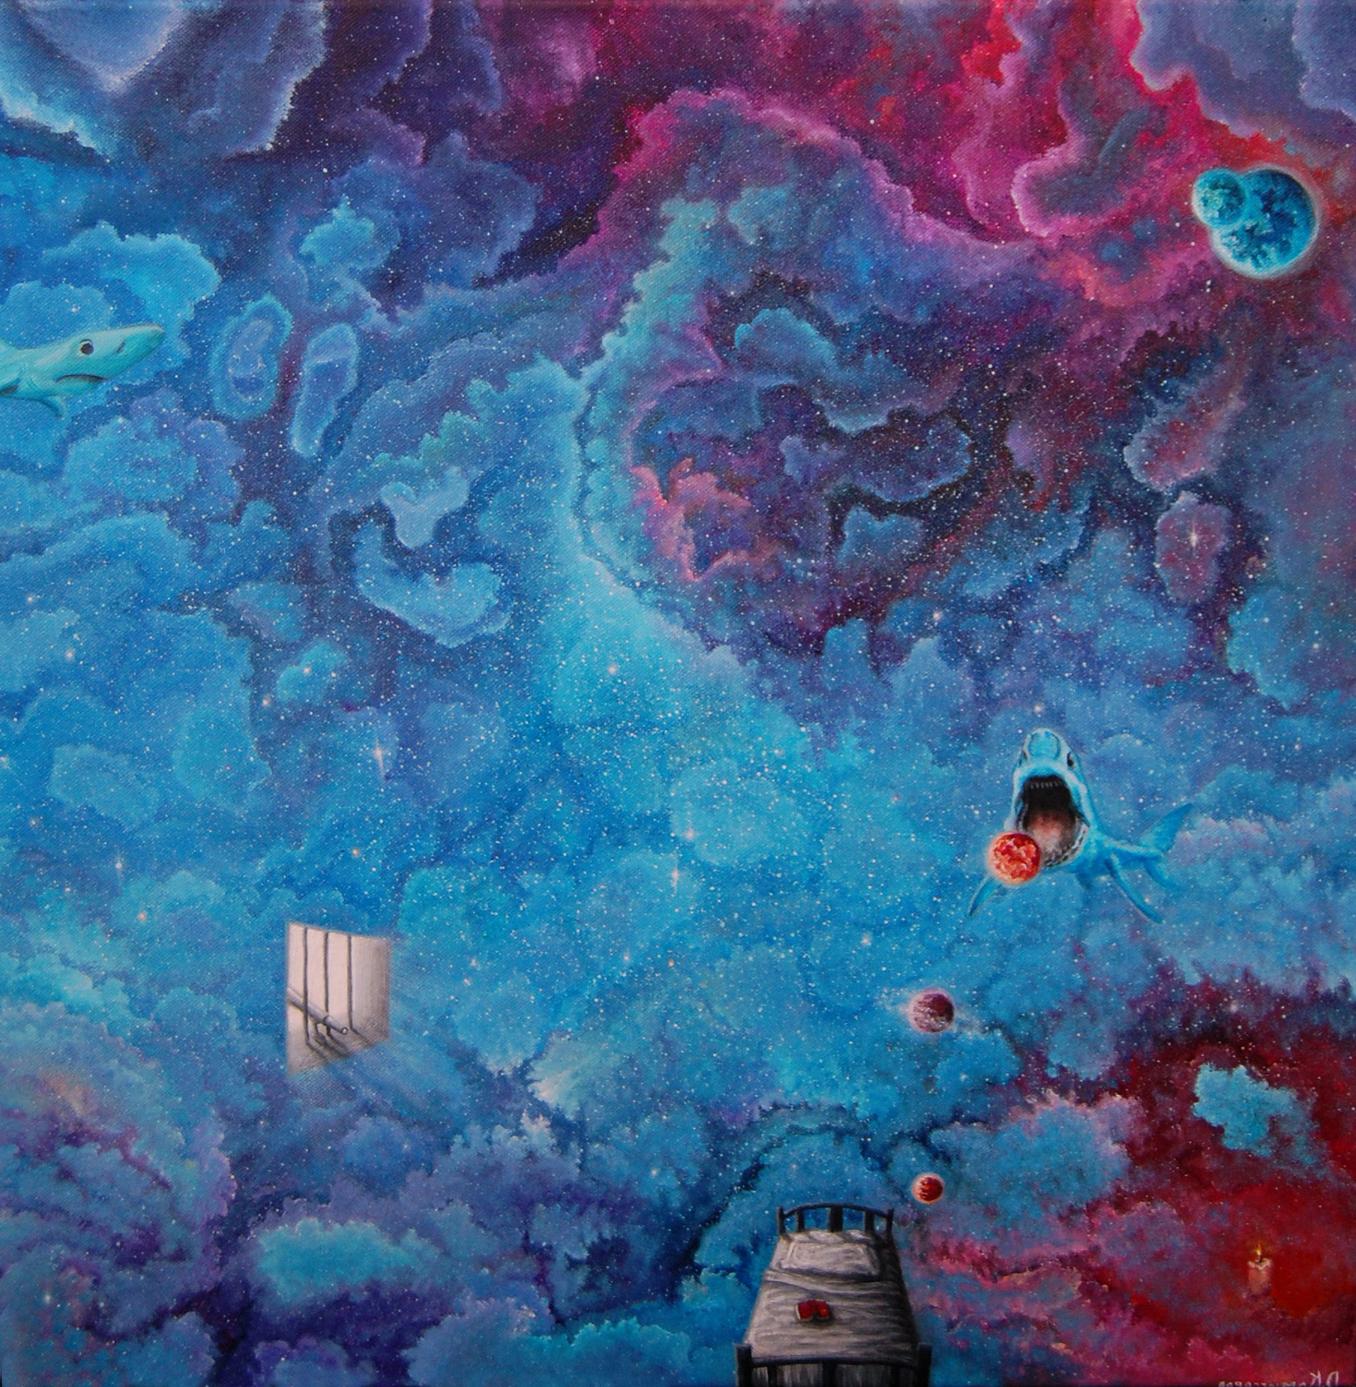 Dream by DenisKom